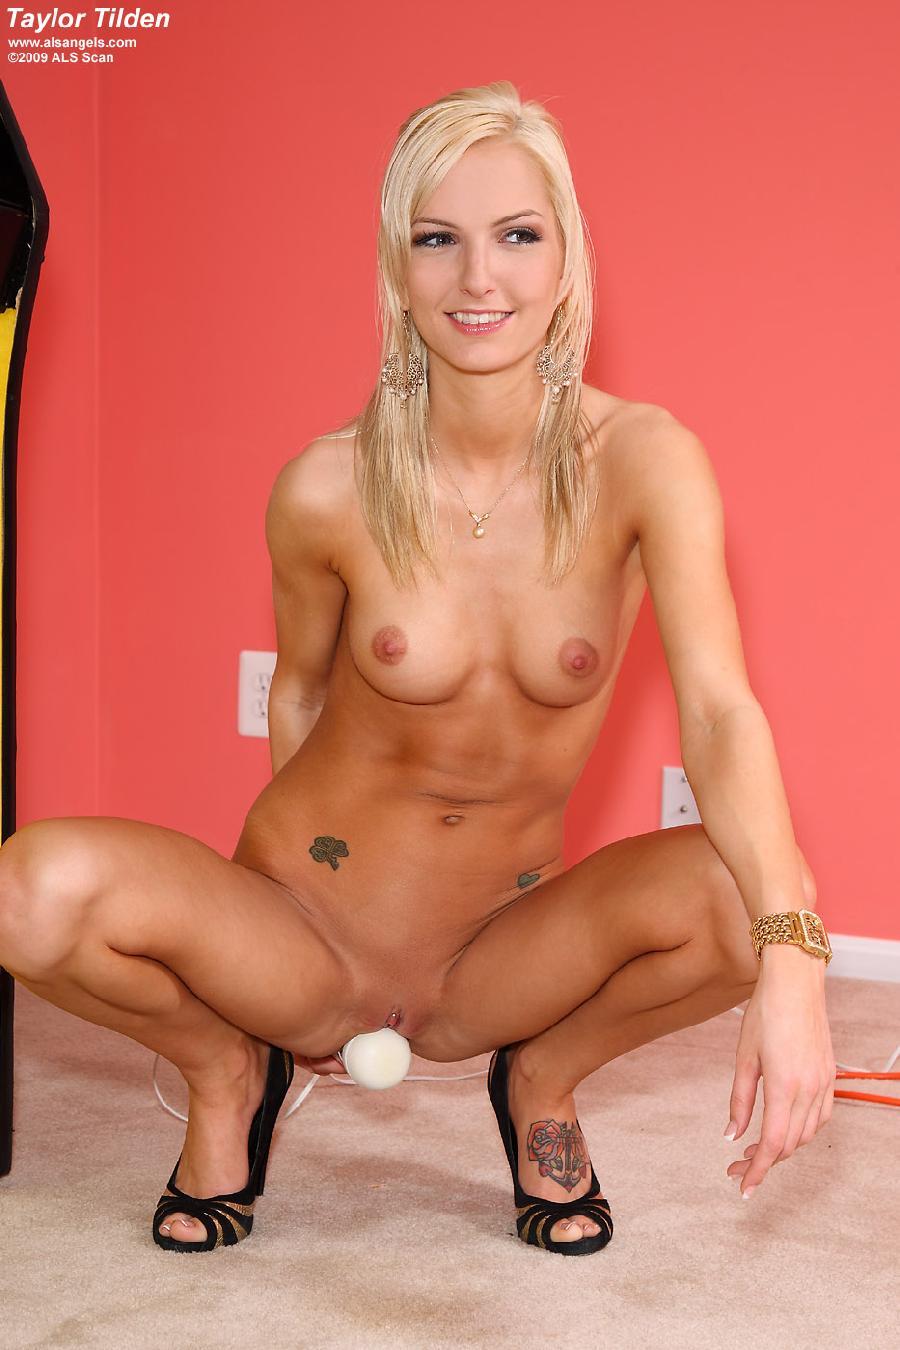 Naked hottie and big vibrator - Taylor Tilden - 9